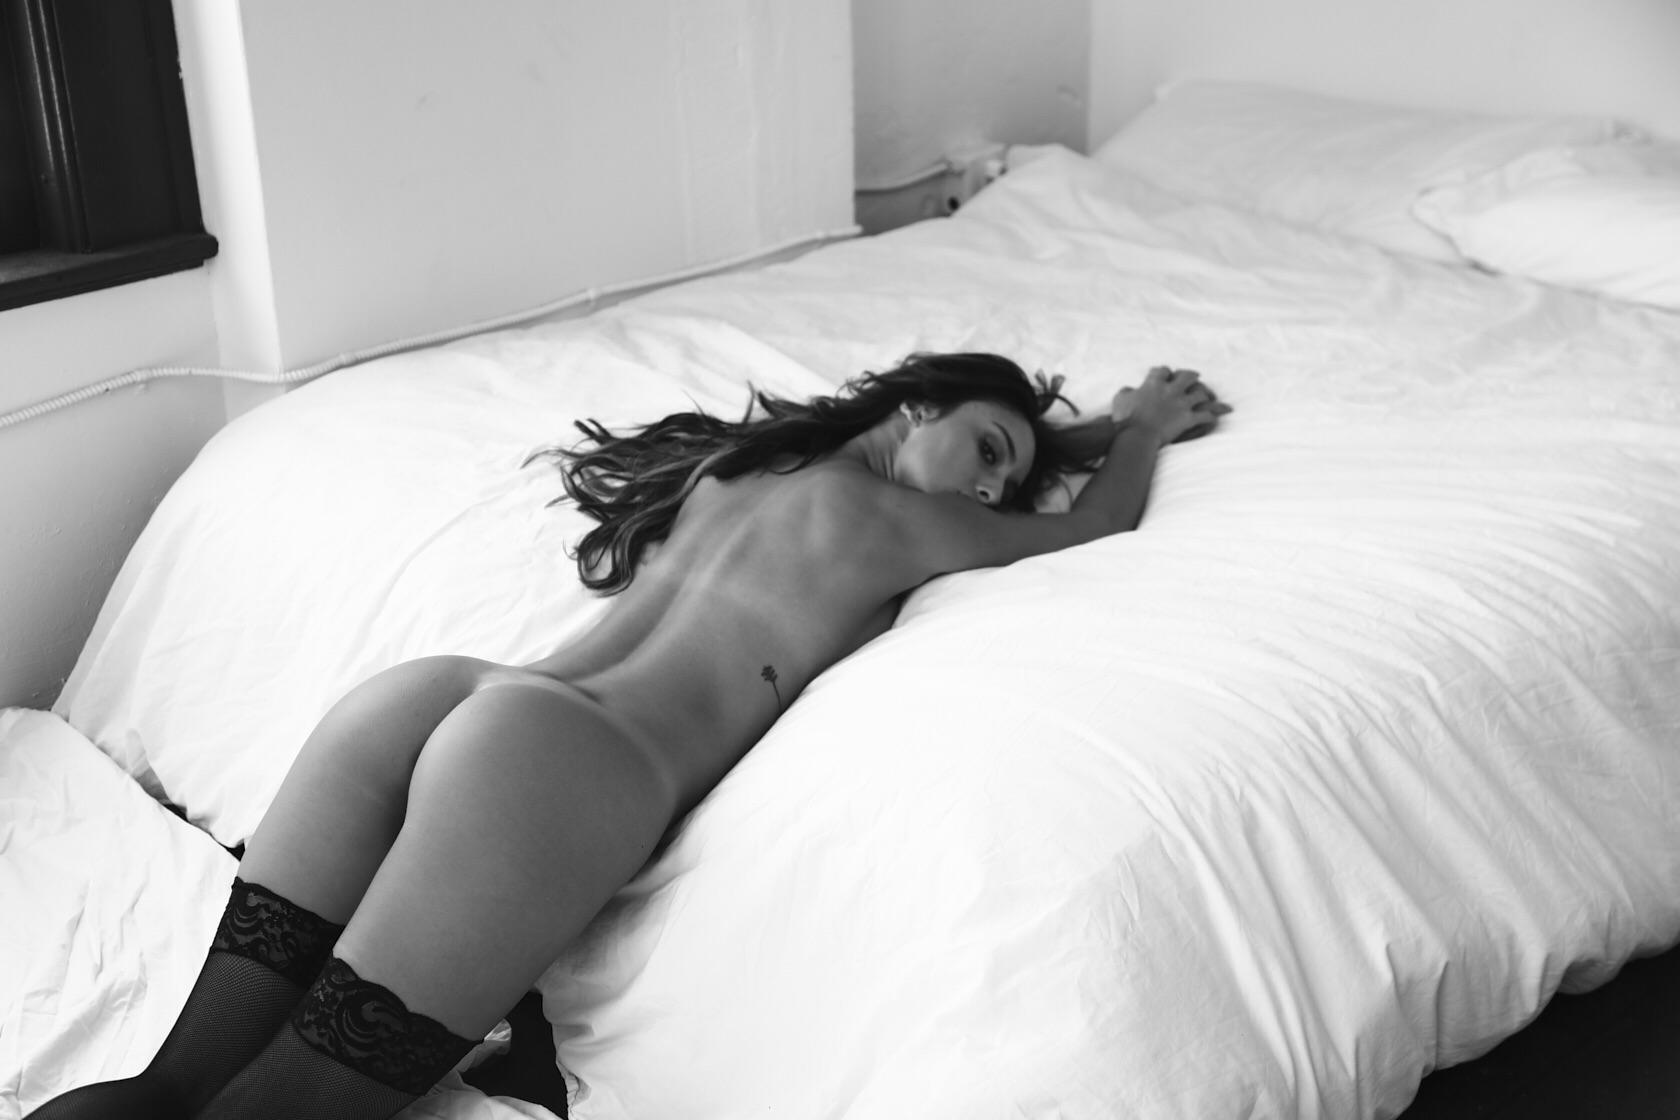 Julia rose porn pic, gifs and pics